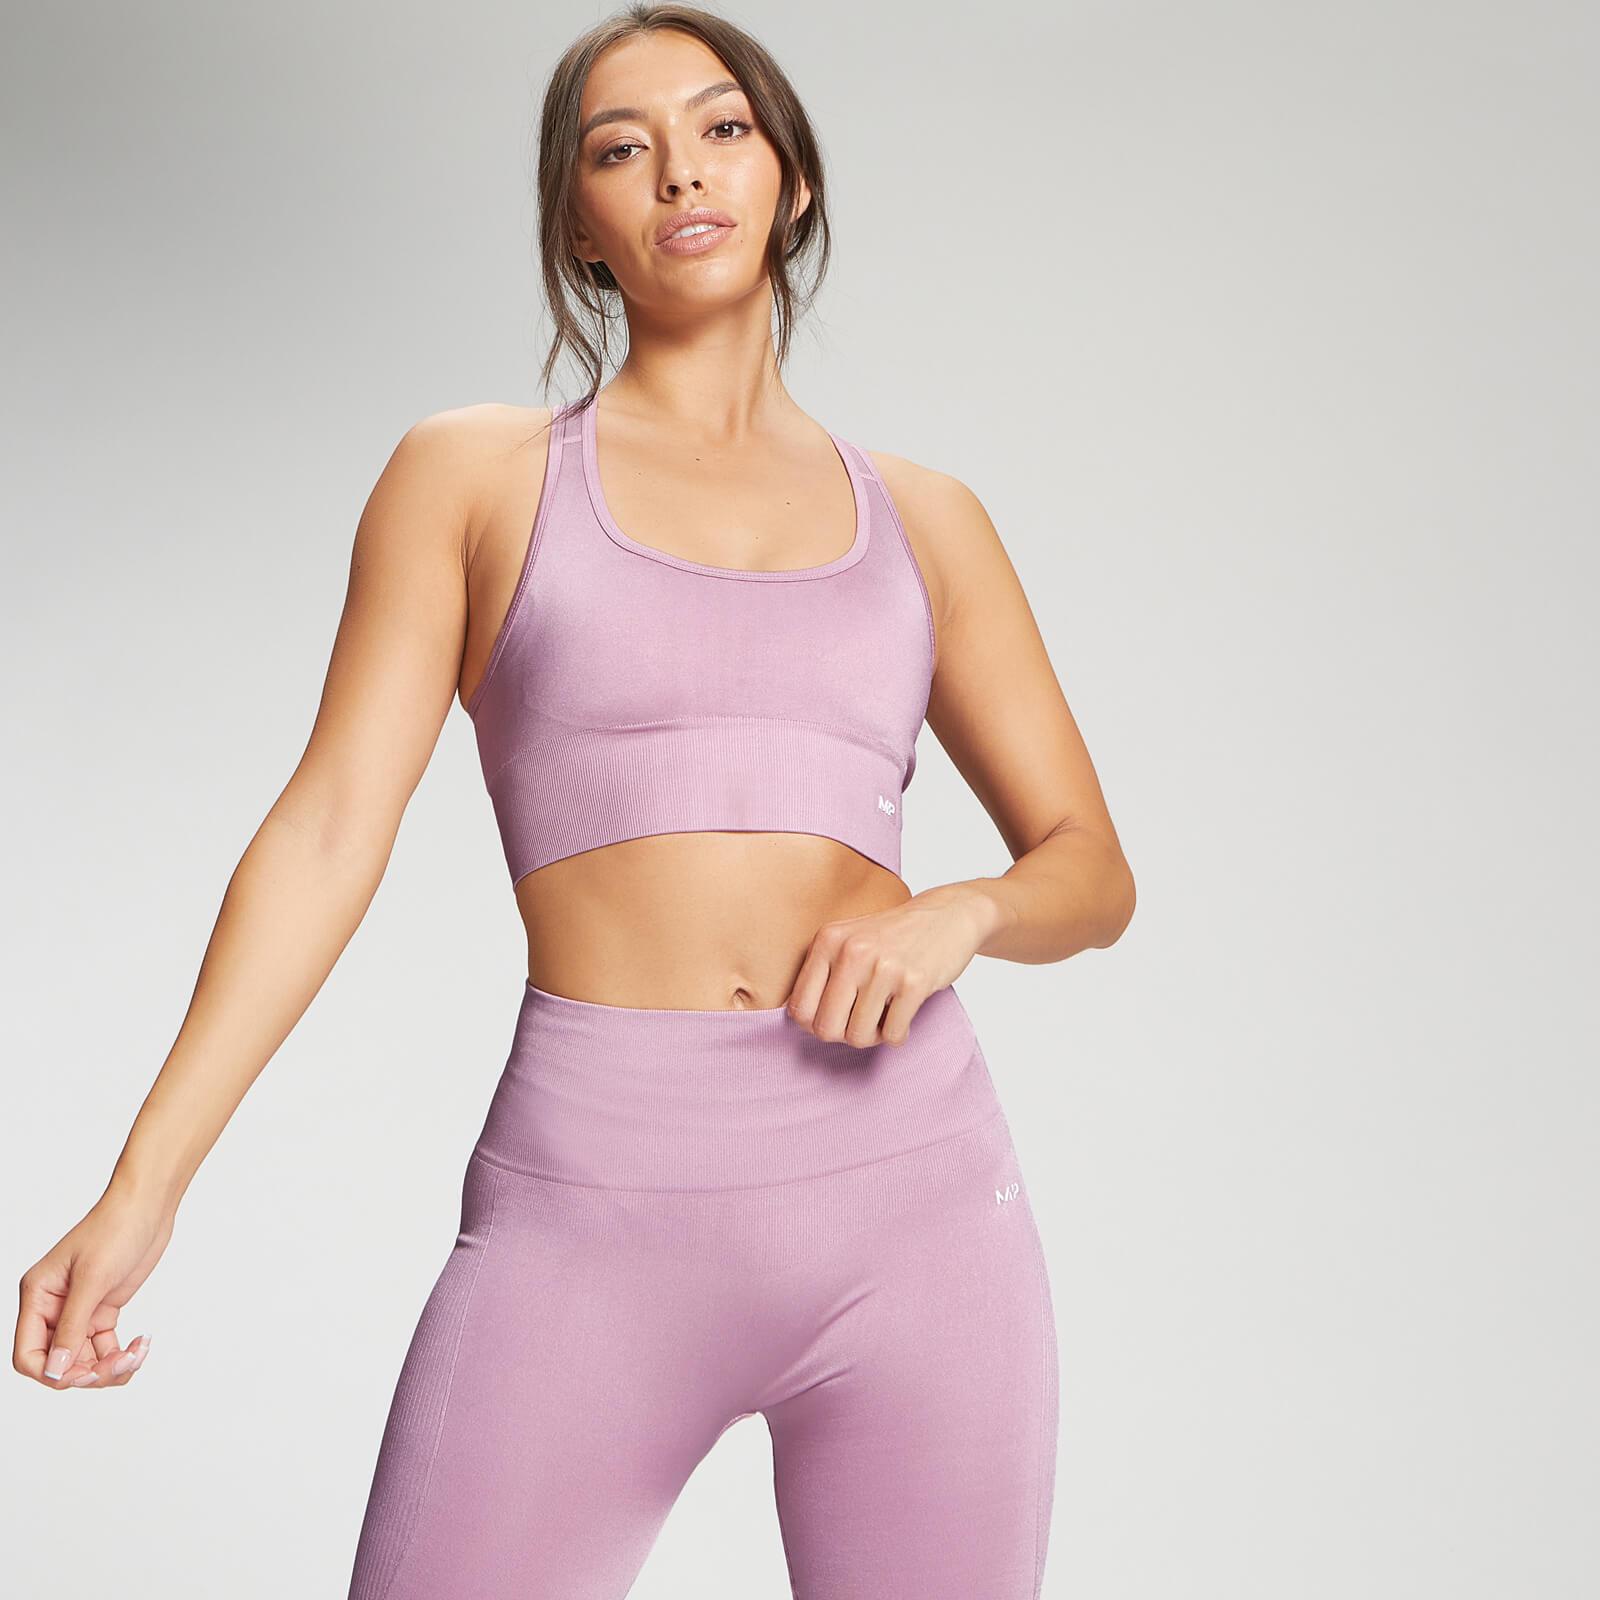 Купить MP Women's Limited Edition Shape Seamless Ultra Sports Bra - Pink - XS, Myprotein International